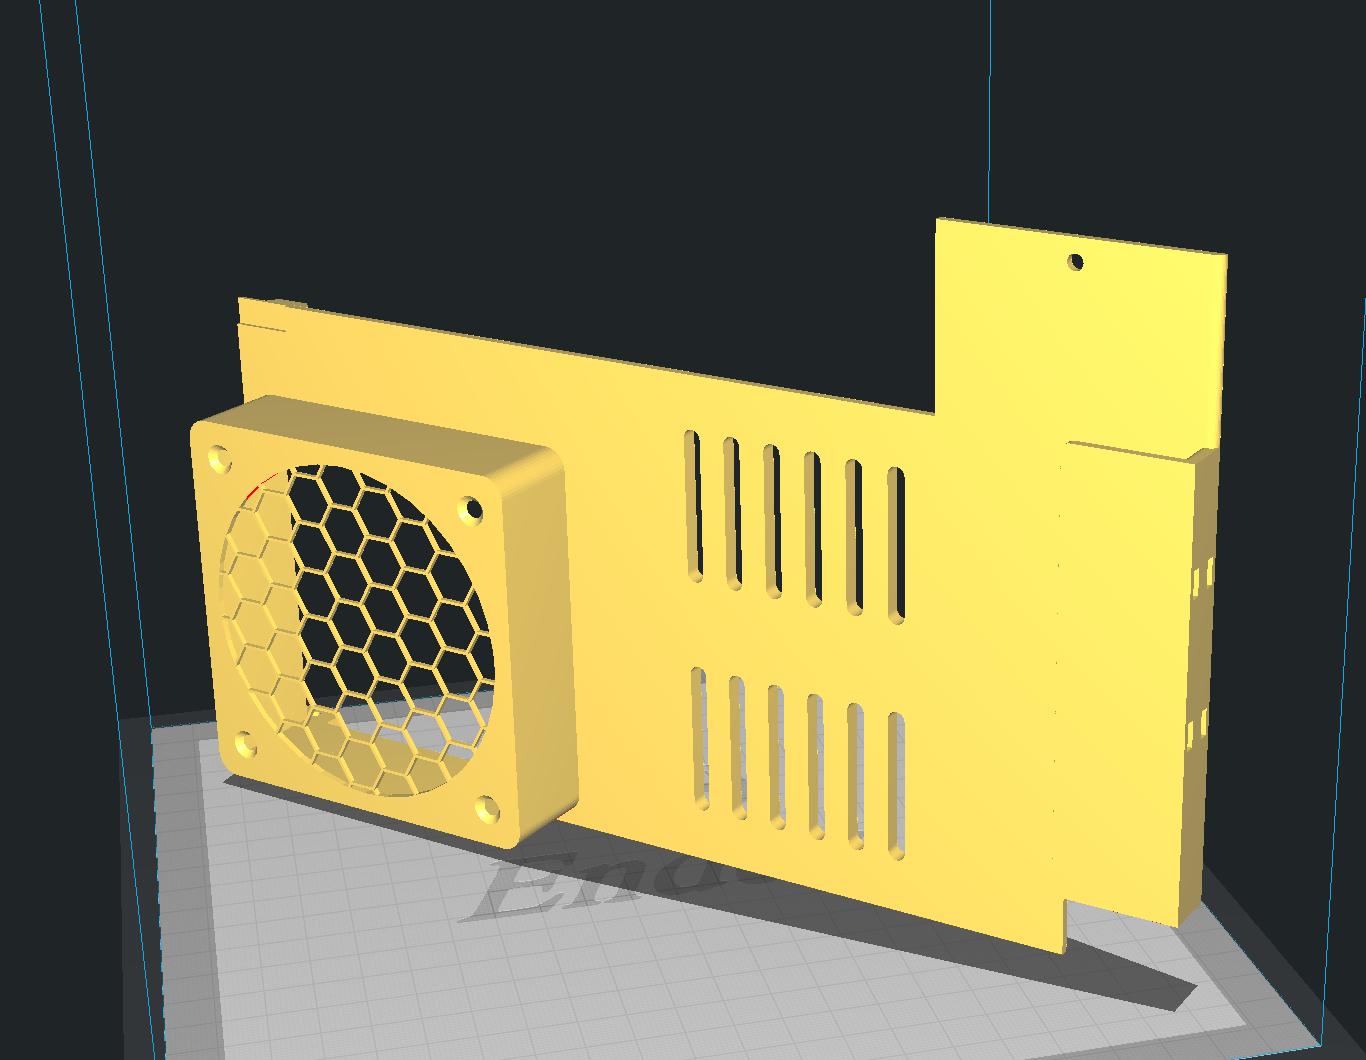 Ender 3 V2 PSU 80*25mm fan